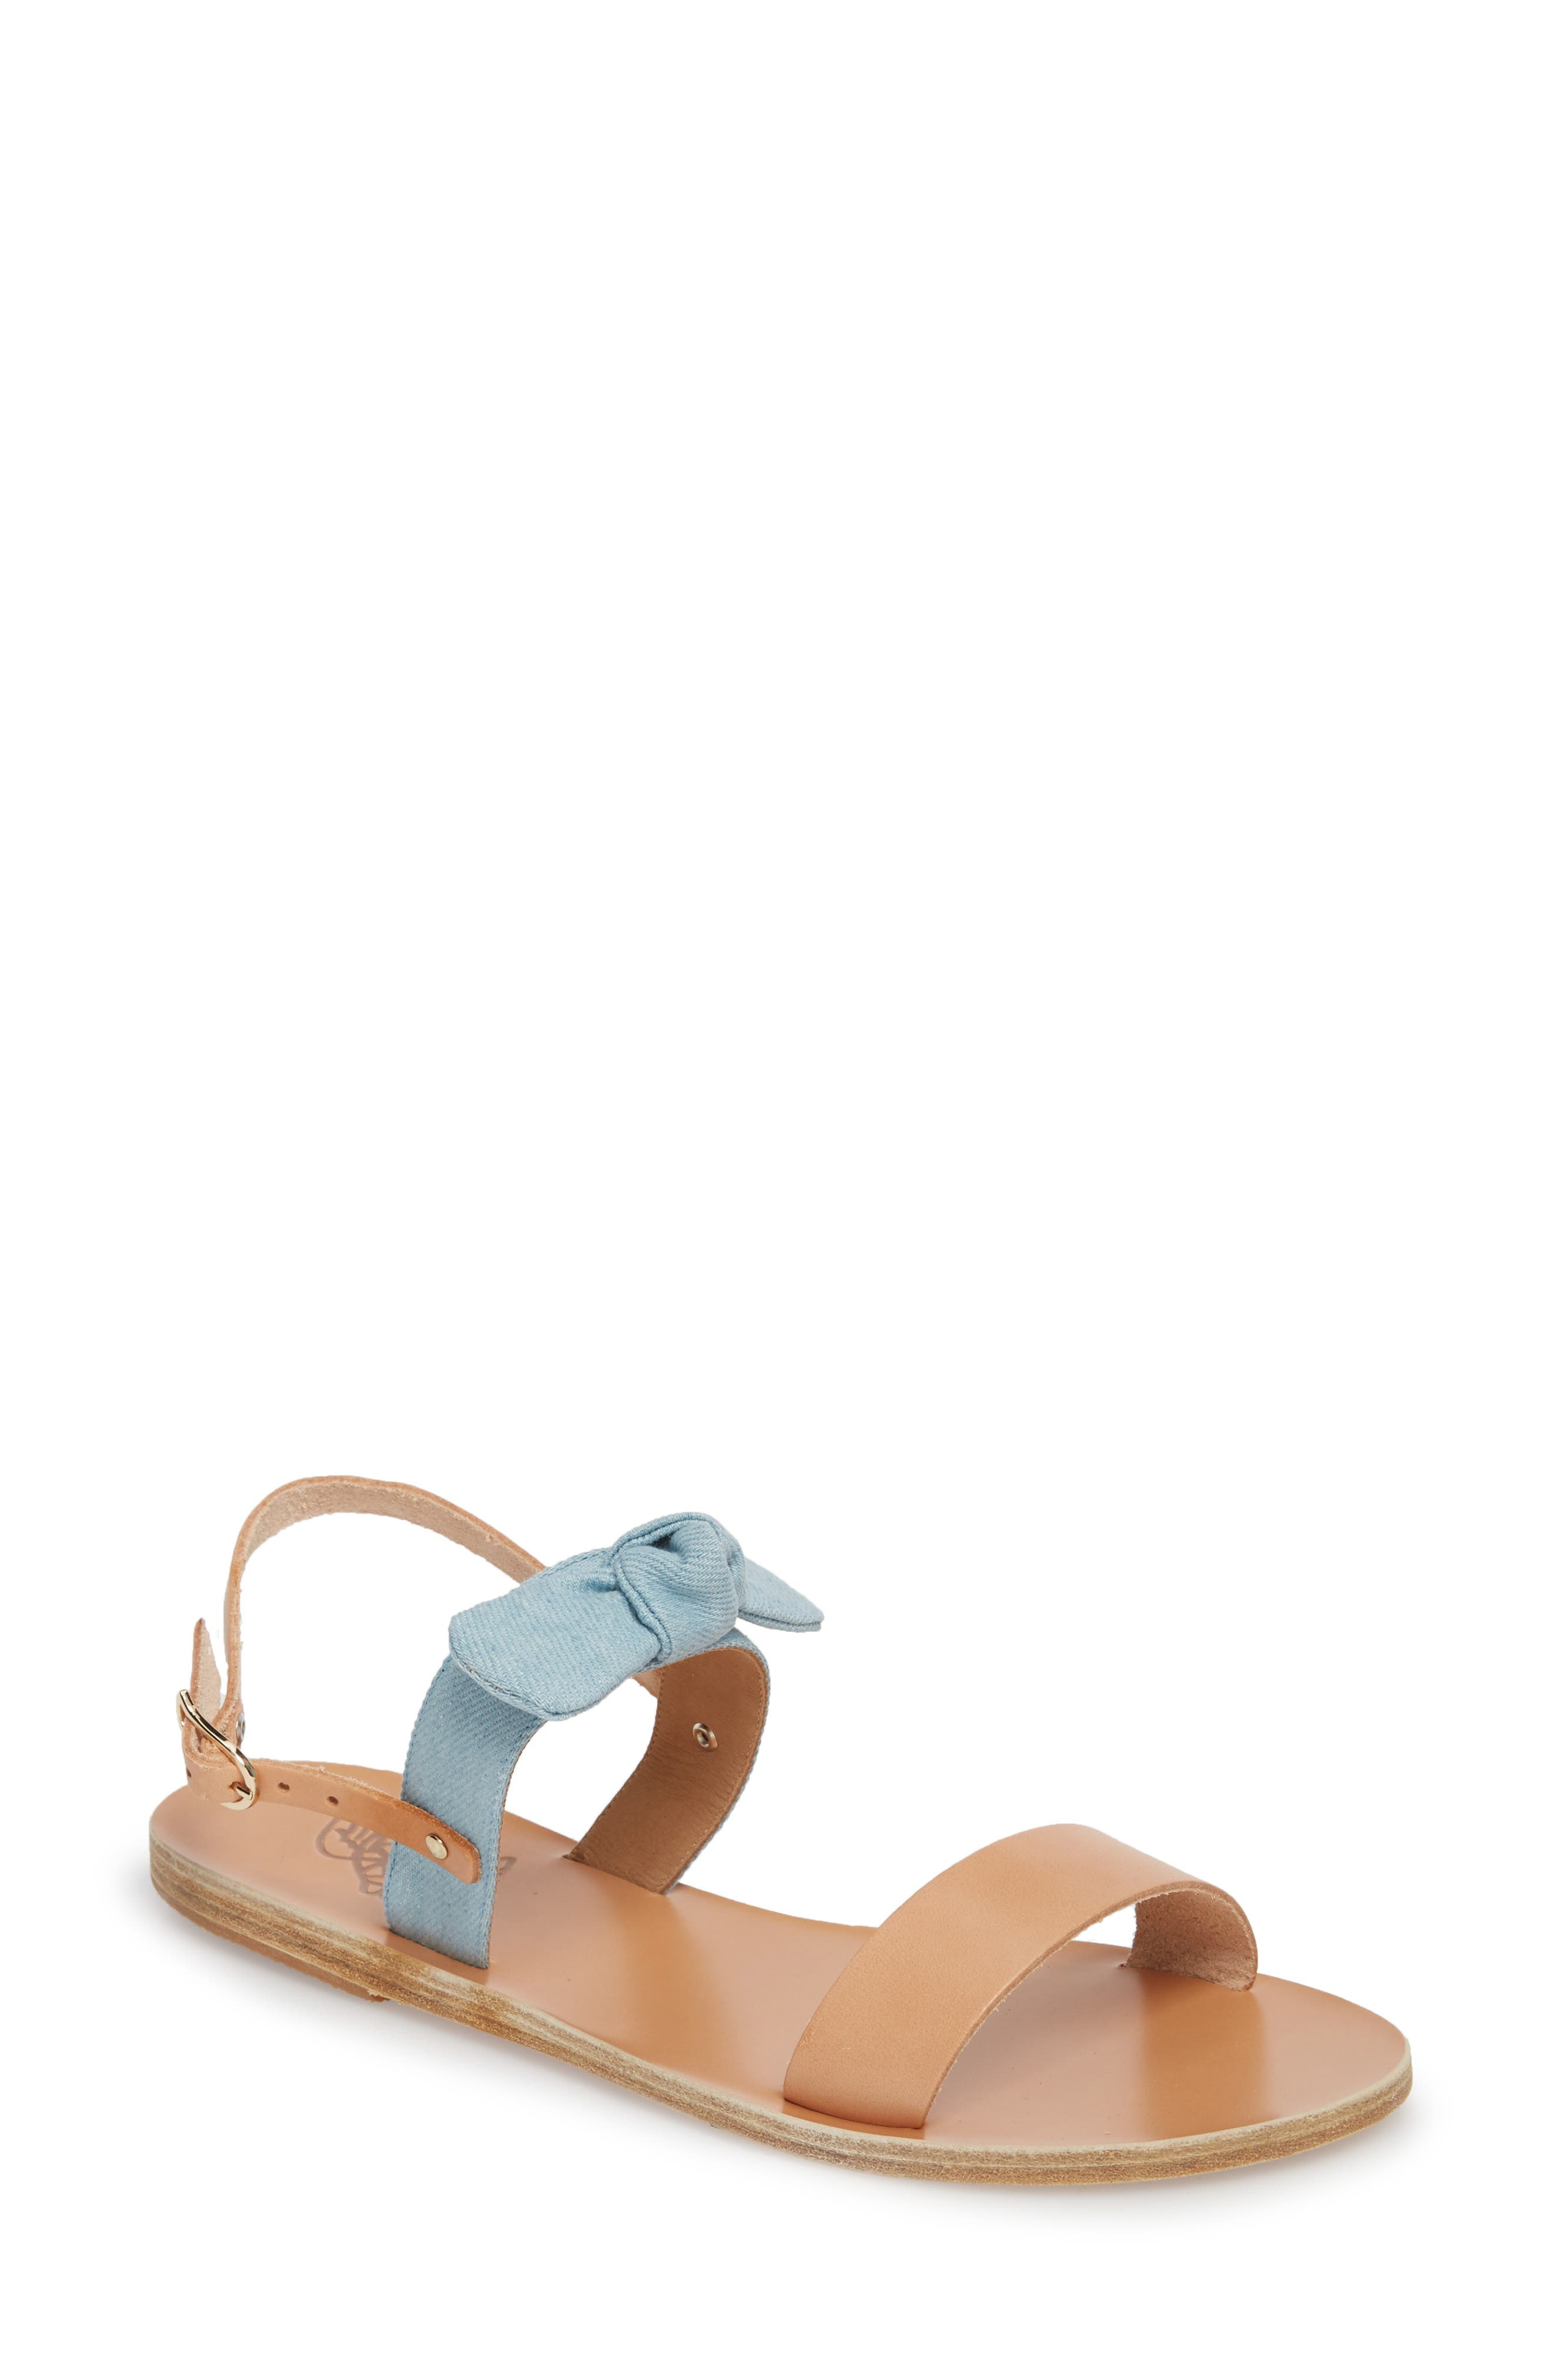 Clio Bow Sandal,                             Main thumbnail 1, color,